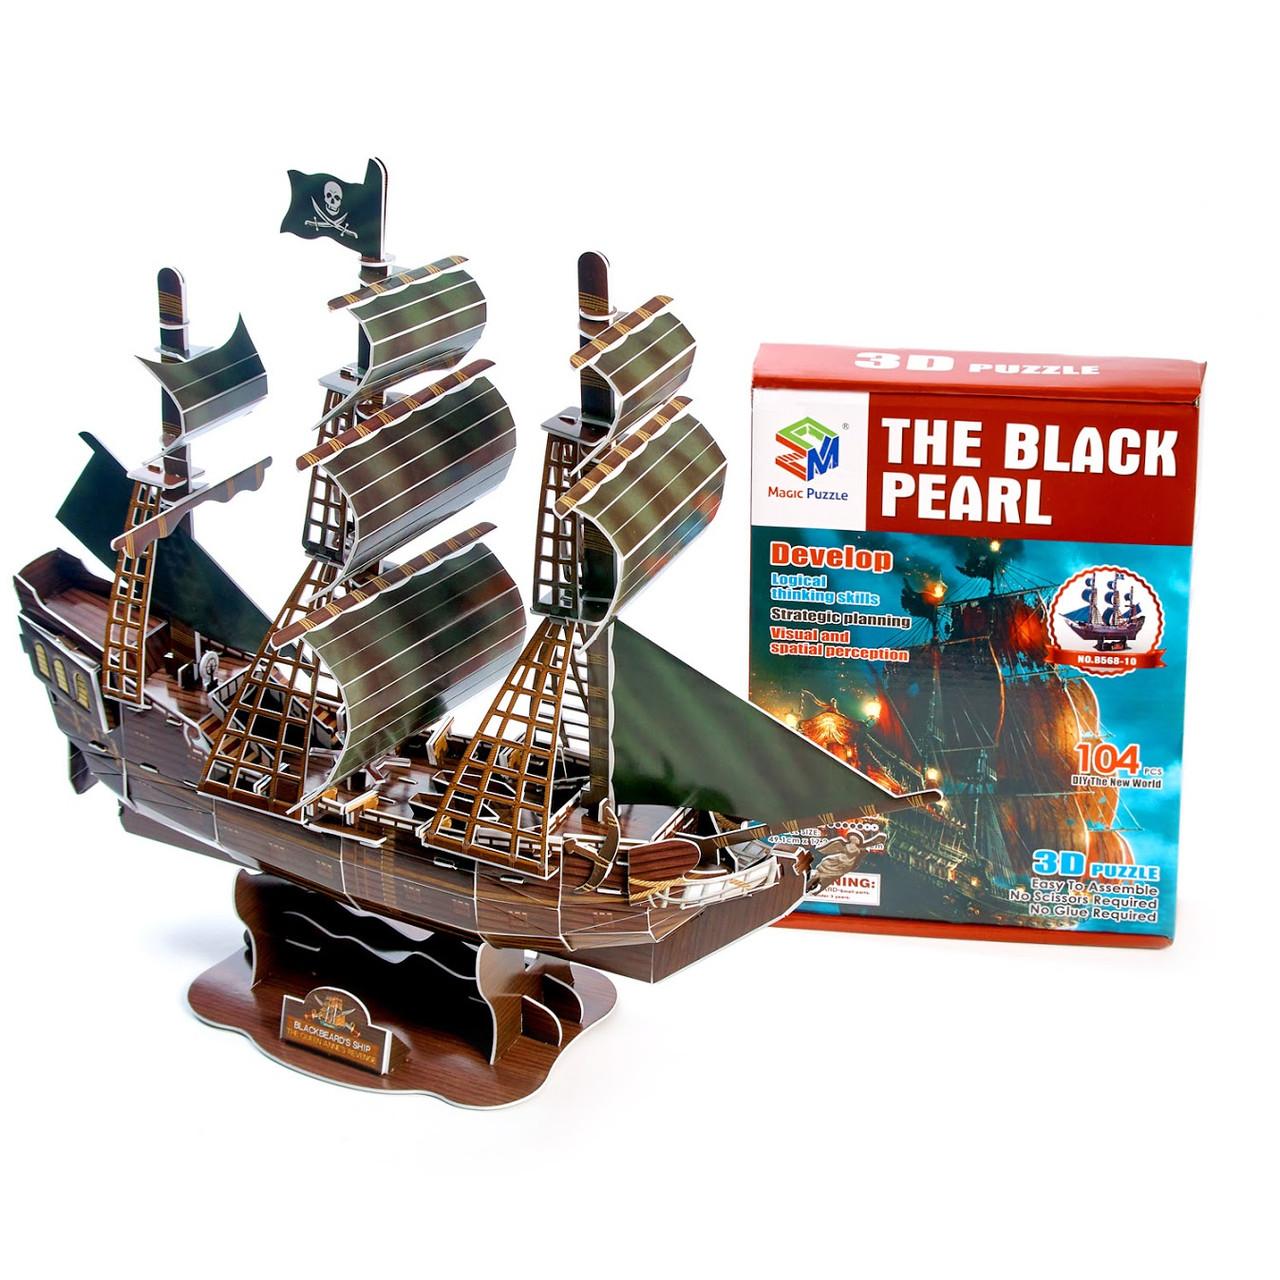 "Огромные 3д пазлы "" THE BLACK  PEARL "" Трехмерный конструктор-головоломка  43.4 см * 17.2 см * 49.1 см *"